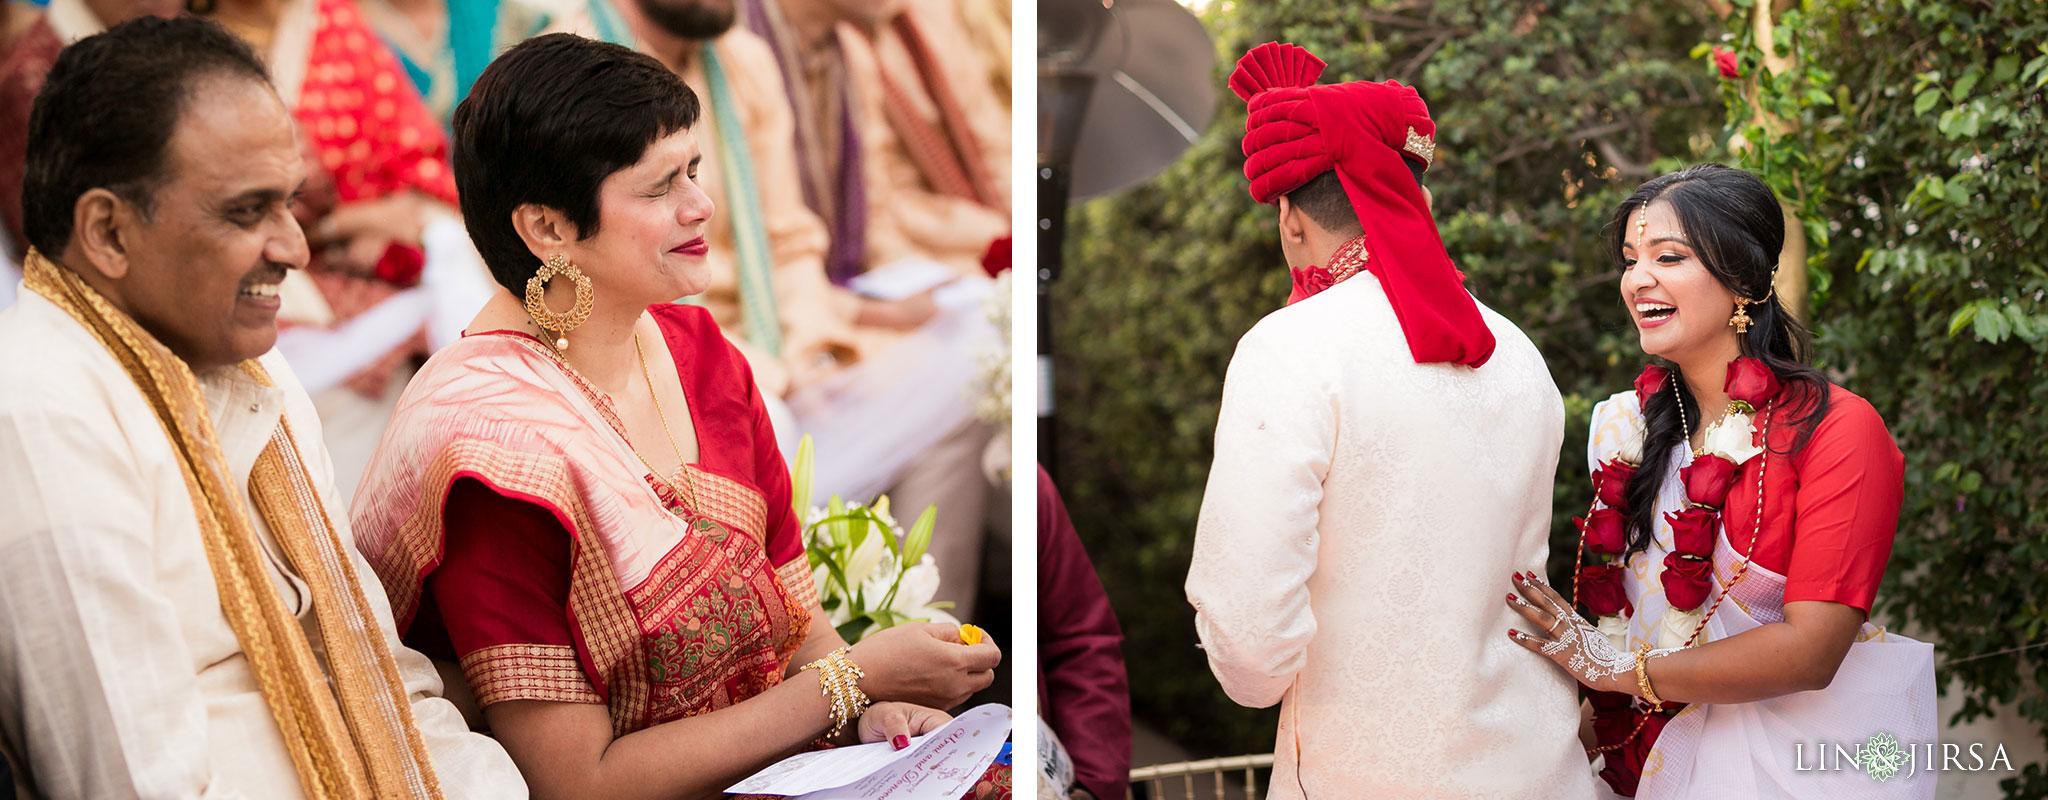 46 Orange County Indian Wedding Photography